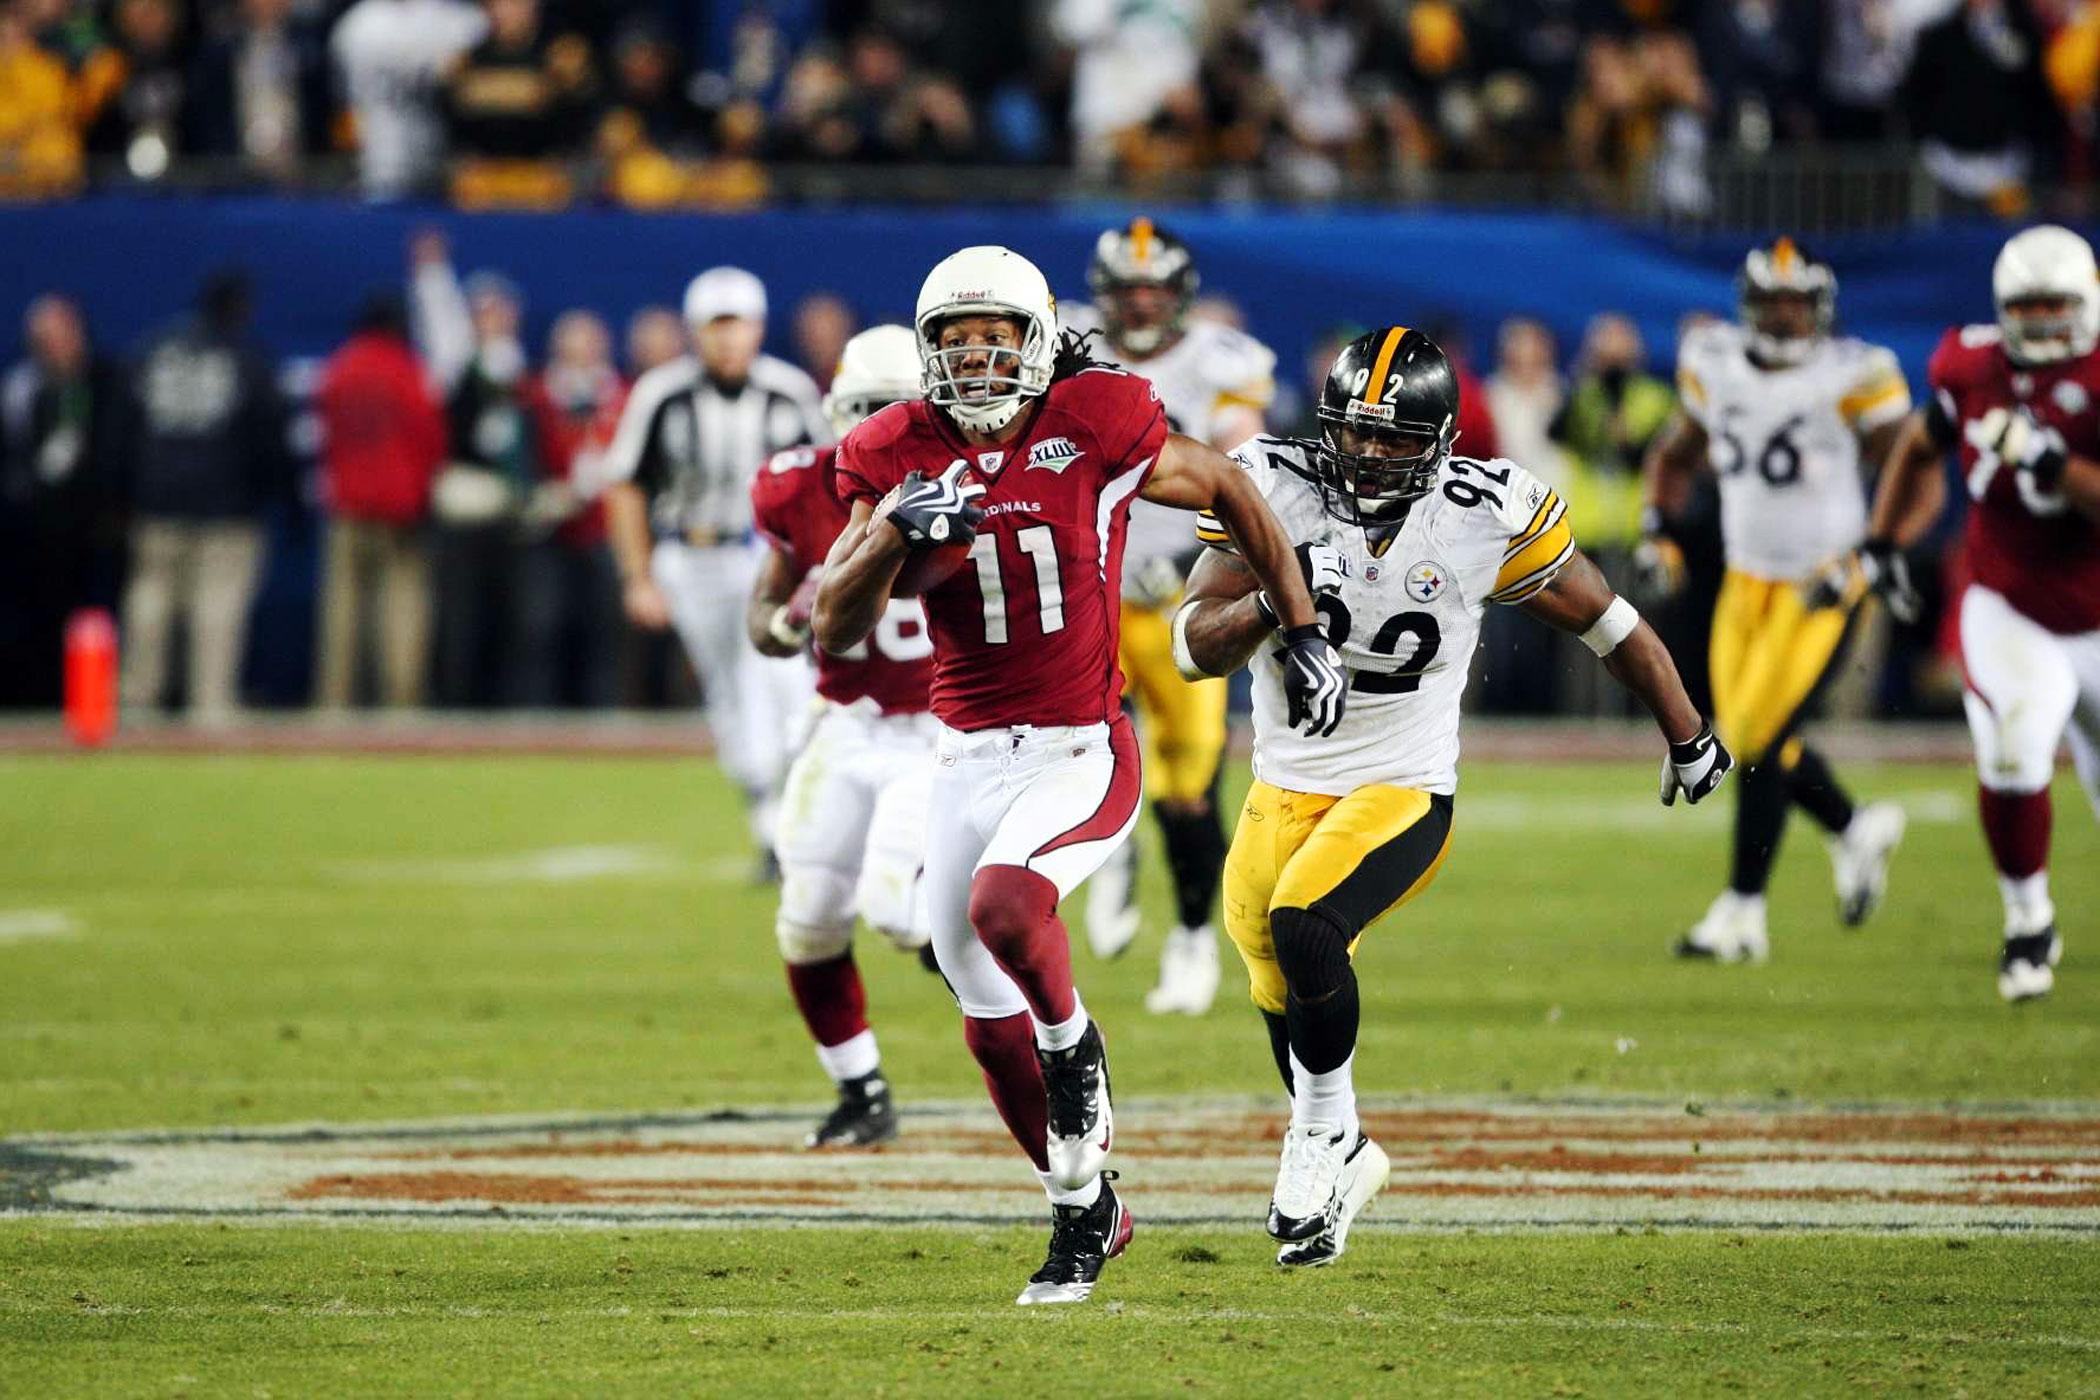 Super Bowl XLIII, Feb. 1, 2009                               Arizona Cardinals vs Pittsburgh Steelers in Tampa, Fla.